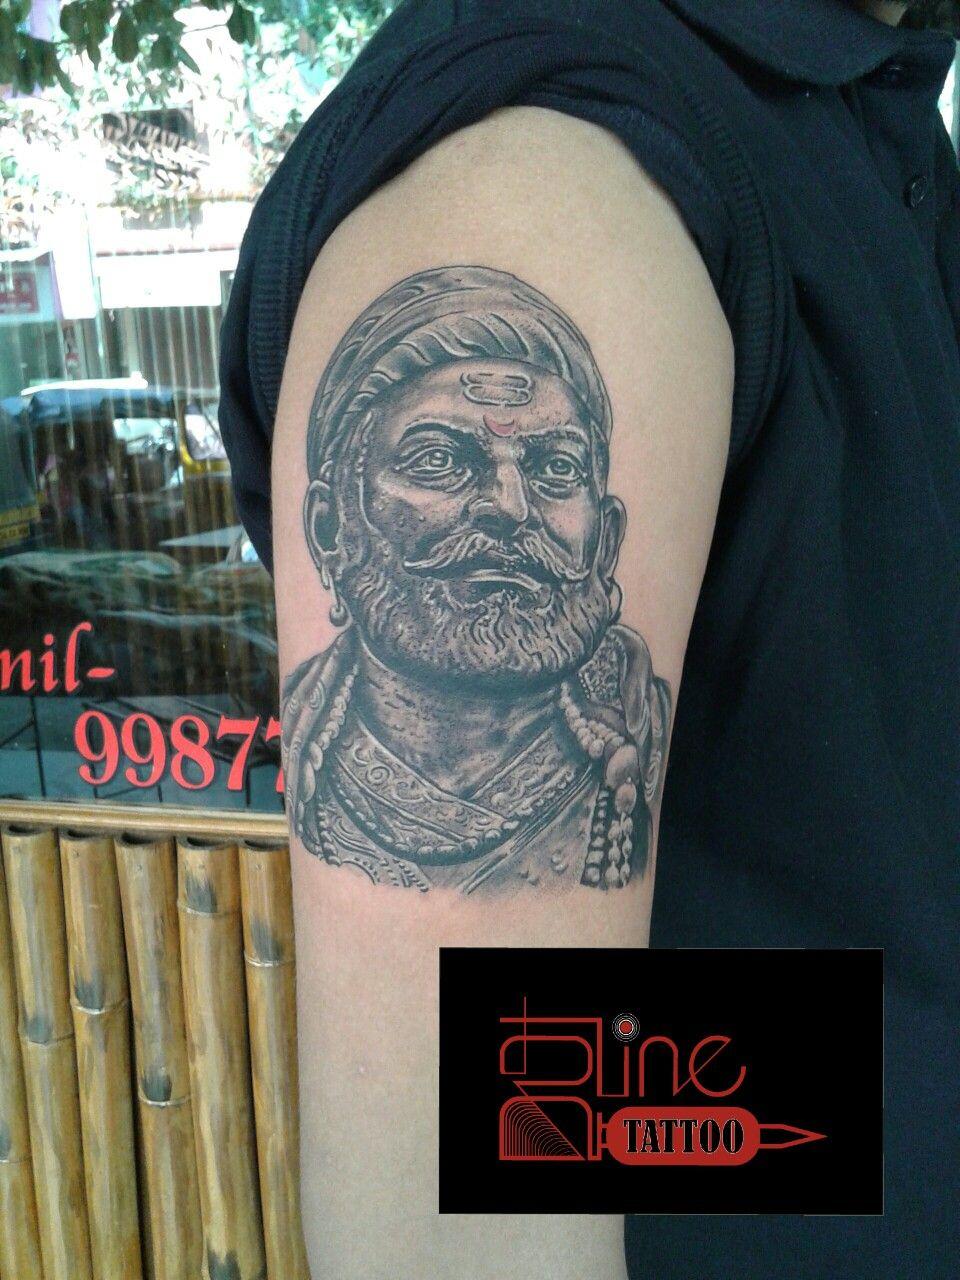 6b04faa211104 Pin by sunil washivale on shivaji maharaj tattoo   Tattoos, Shivaji ...